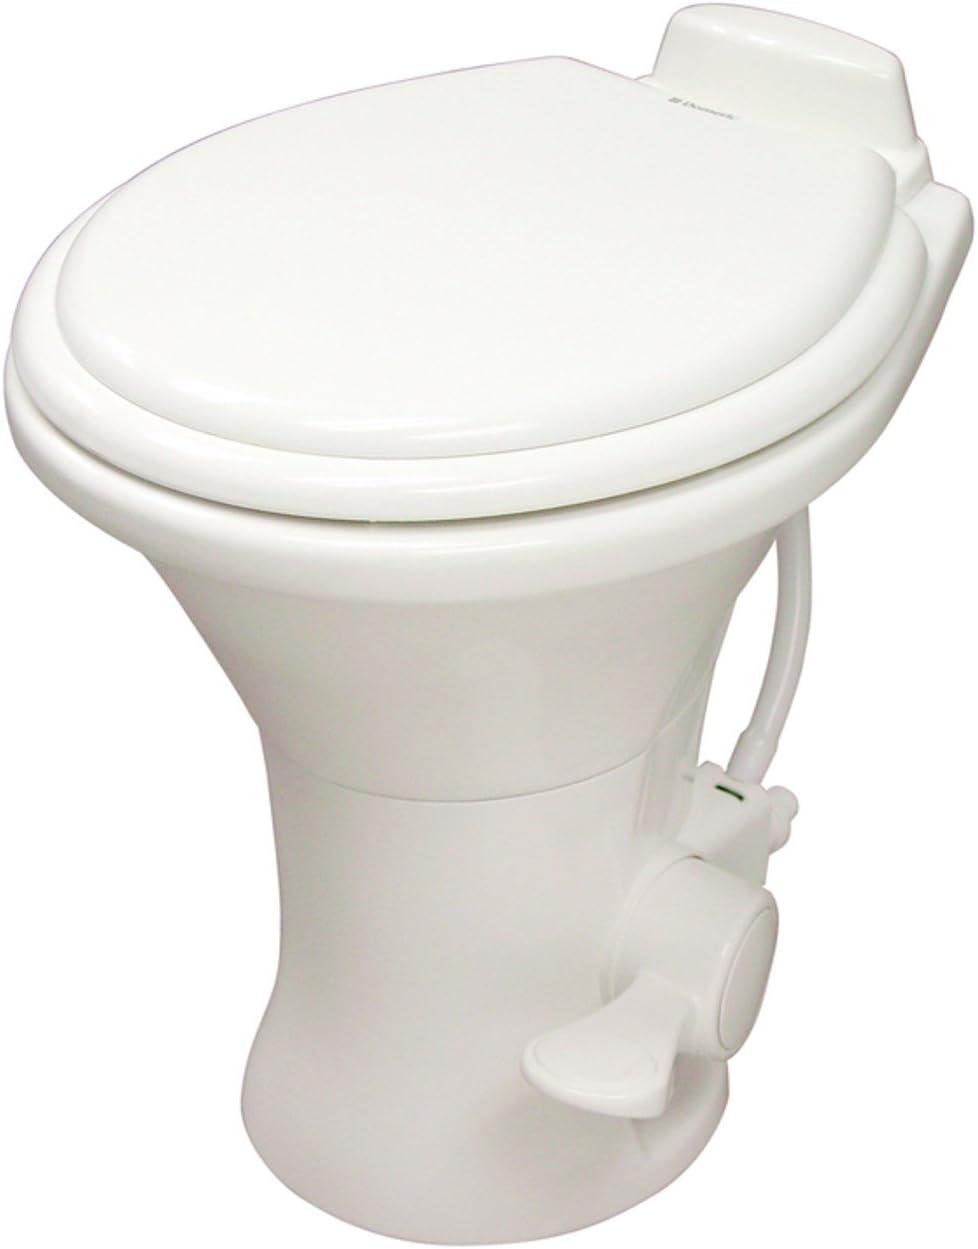 Dometic 310 Series Standard Height Toilet